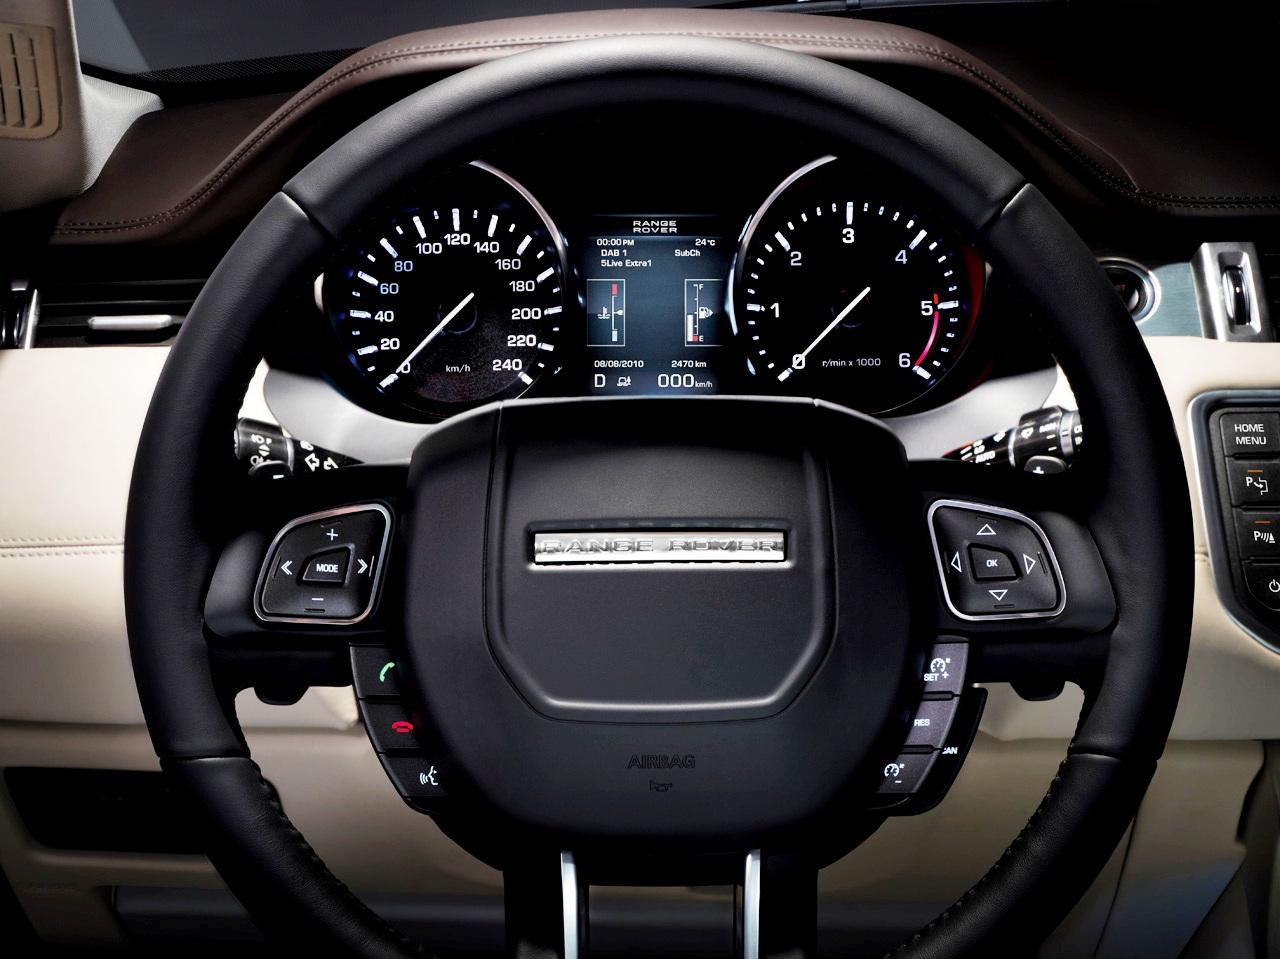 http://1.bp.blogspot.com/-KY__UH0jgO4/TlZIcovQdsI/AAAAAAAAD3Q/-R_4LDCwH64/s1600/Range-Rover-Evoque-Victoria-Beckham-Special-Edition+%25286%2529.jpg